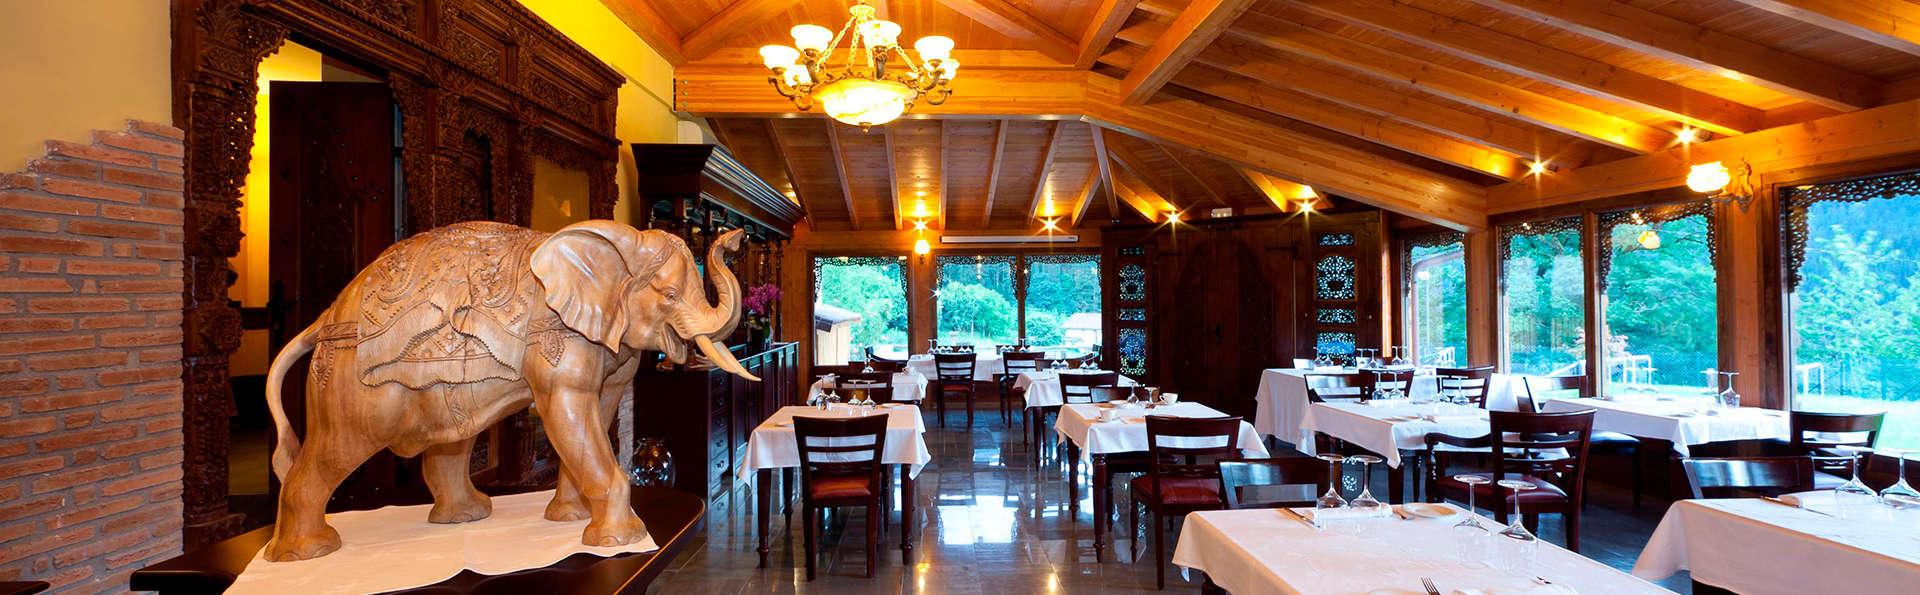 Relais du Silence Hotel & Spa Etxegana - EDIT_restaurant.jpg